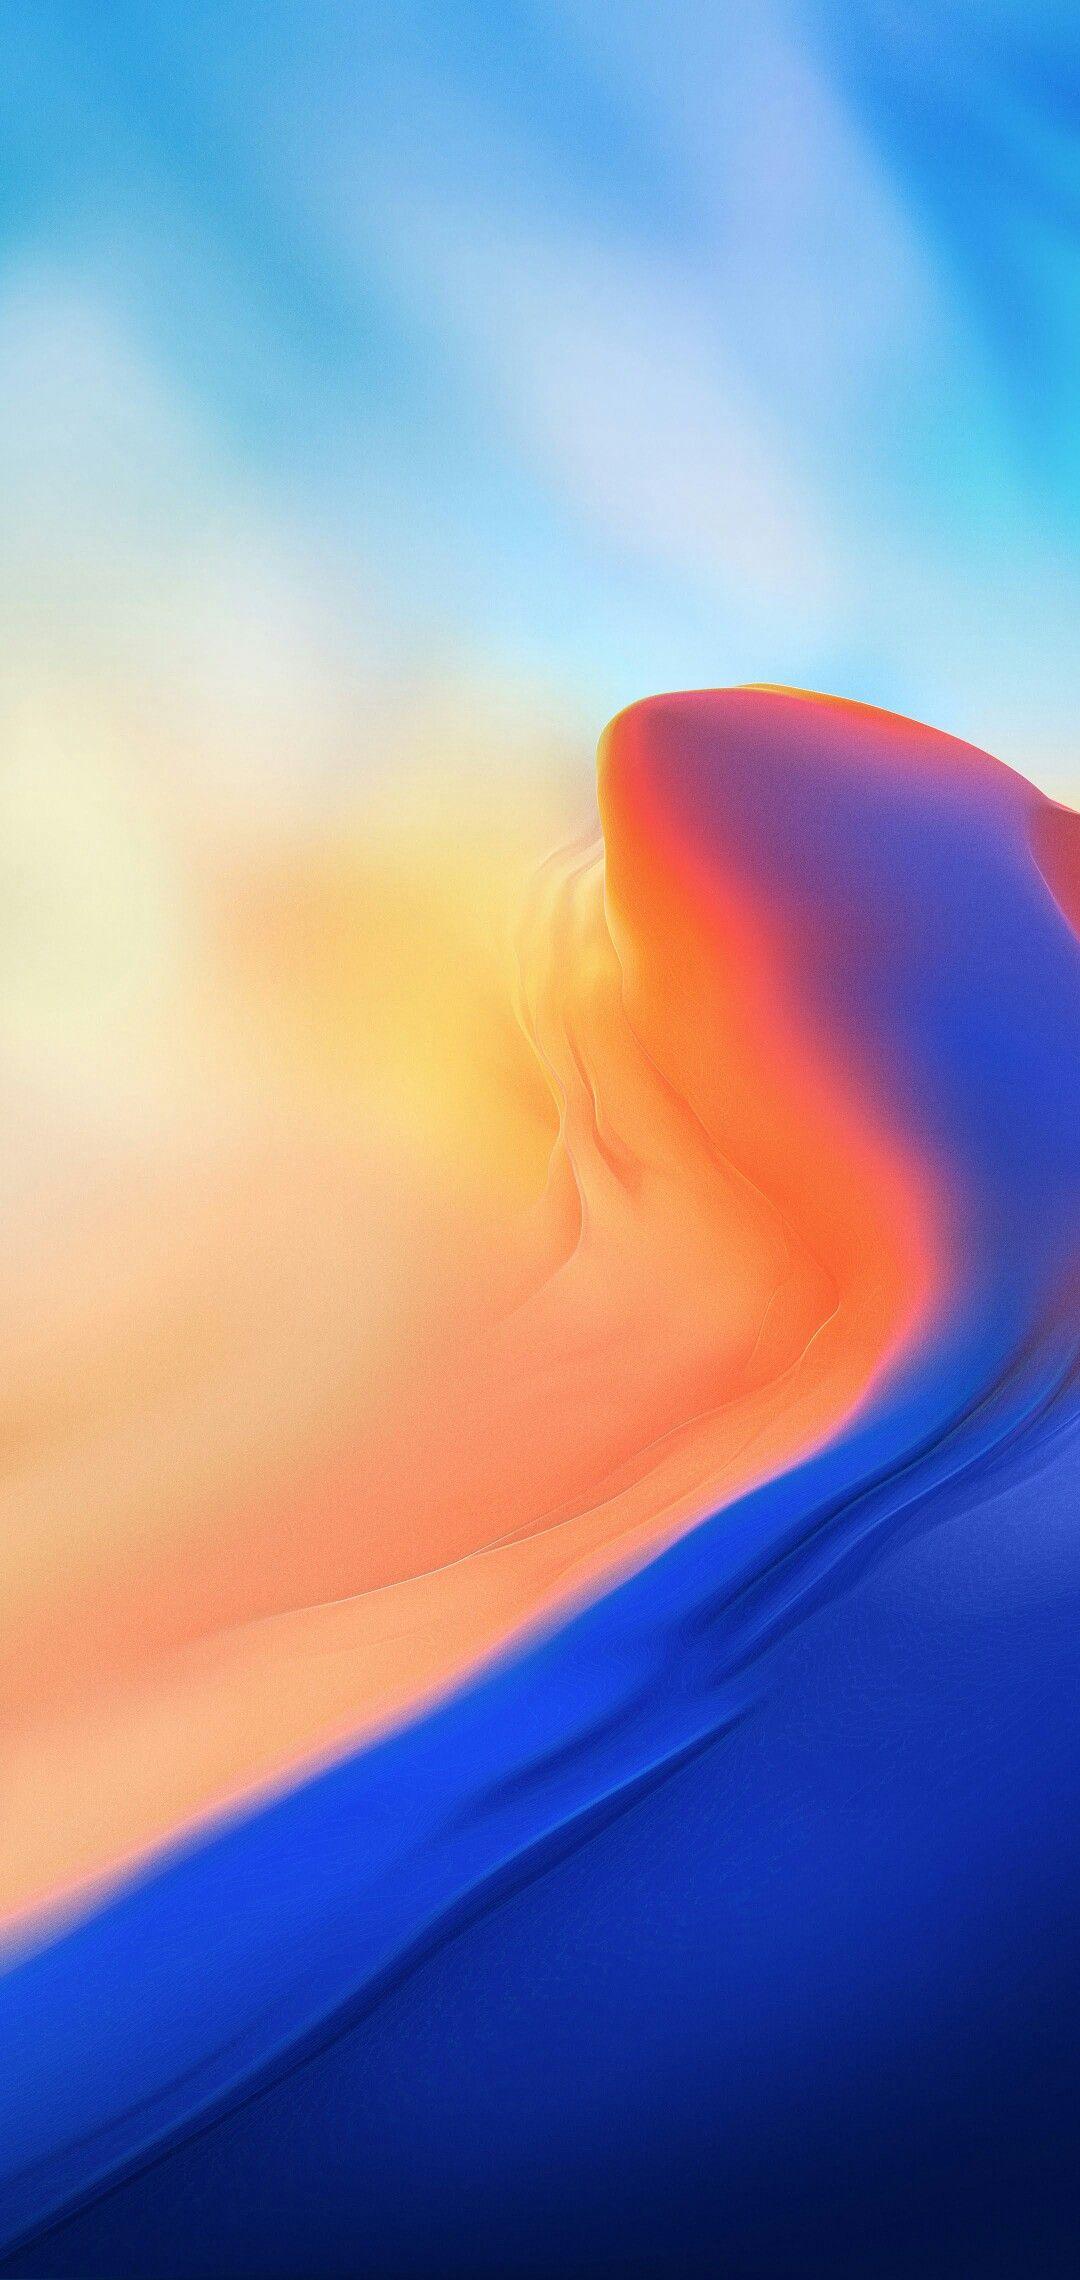 Apple wallpaper by Iyan Sofyan on Abstract °Amoled °Liquid